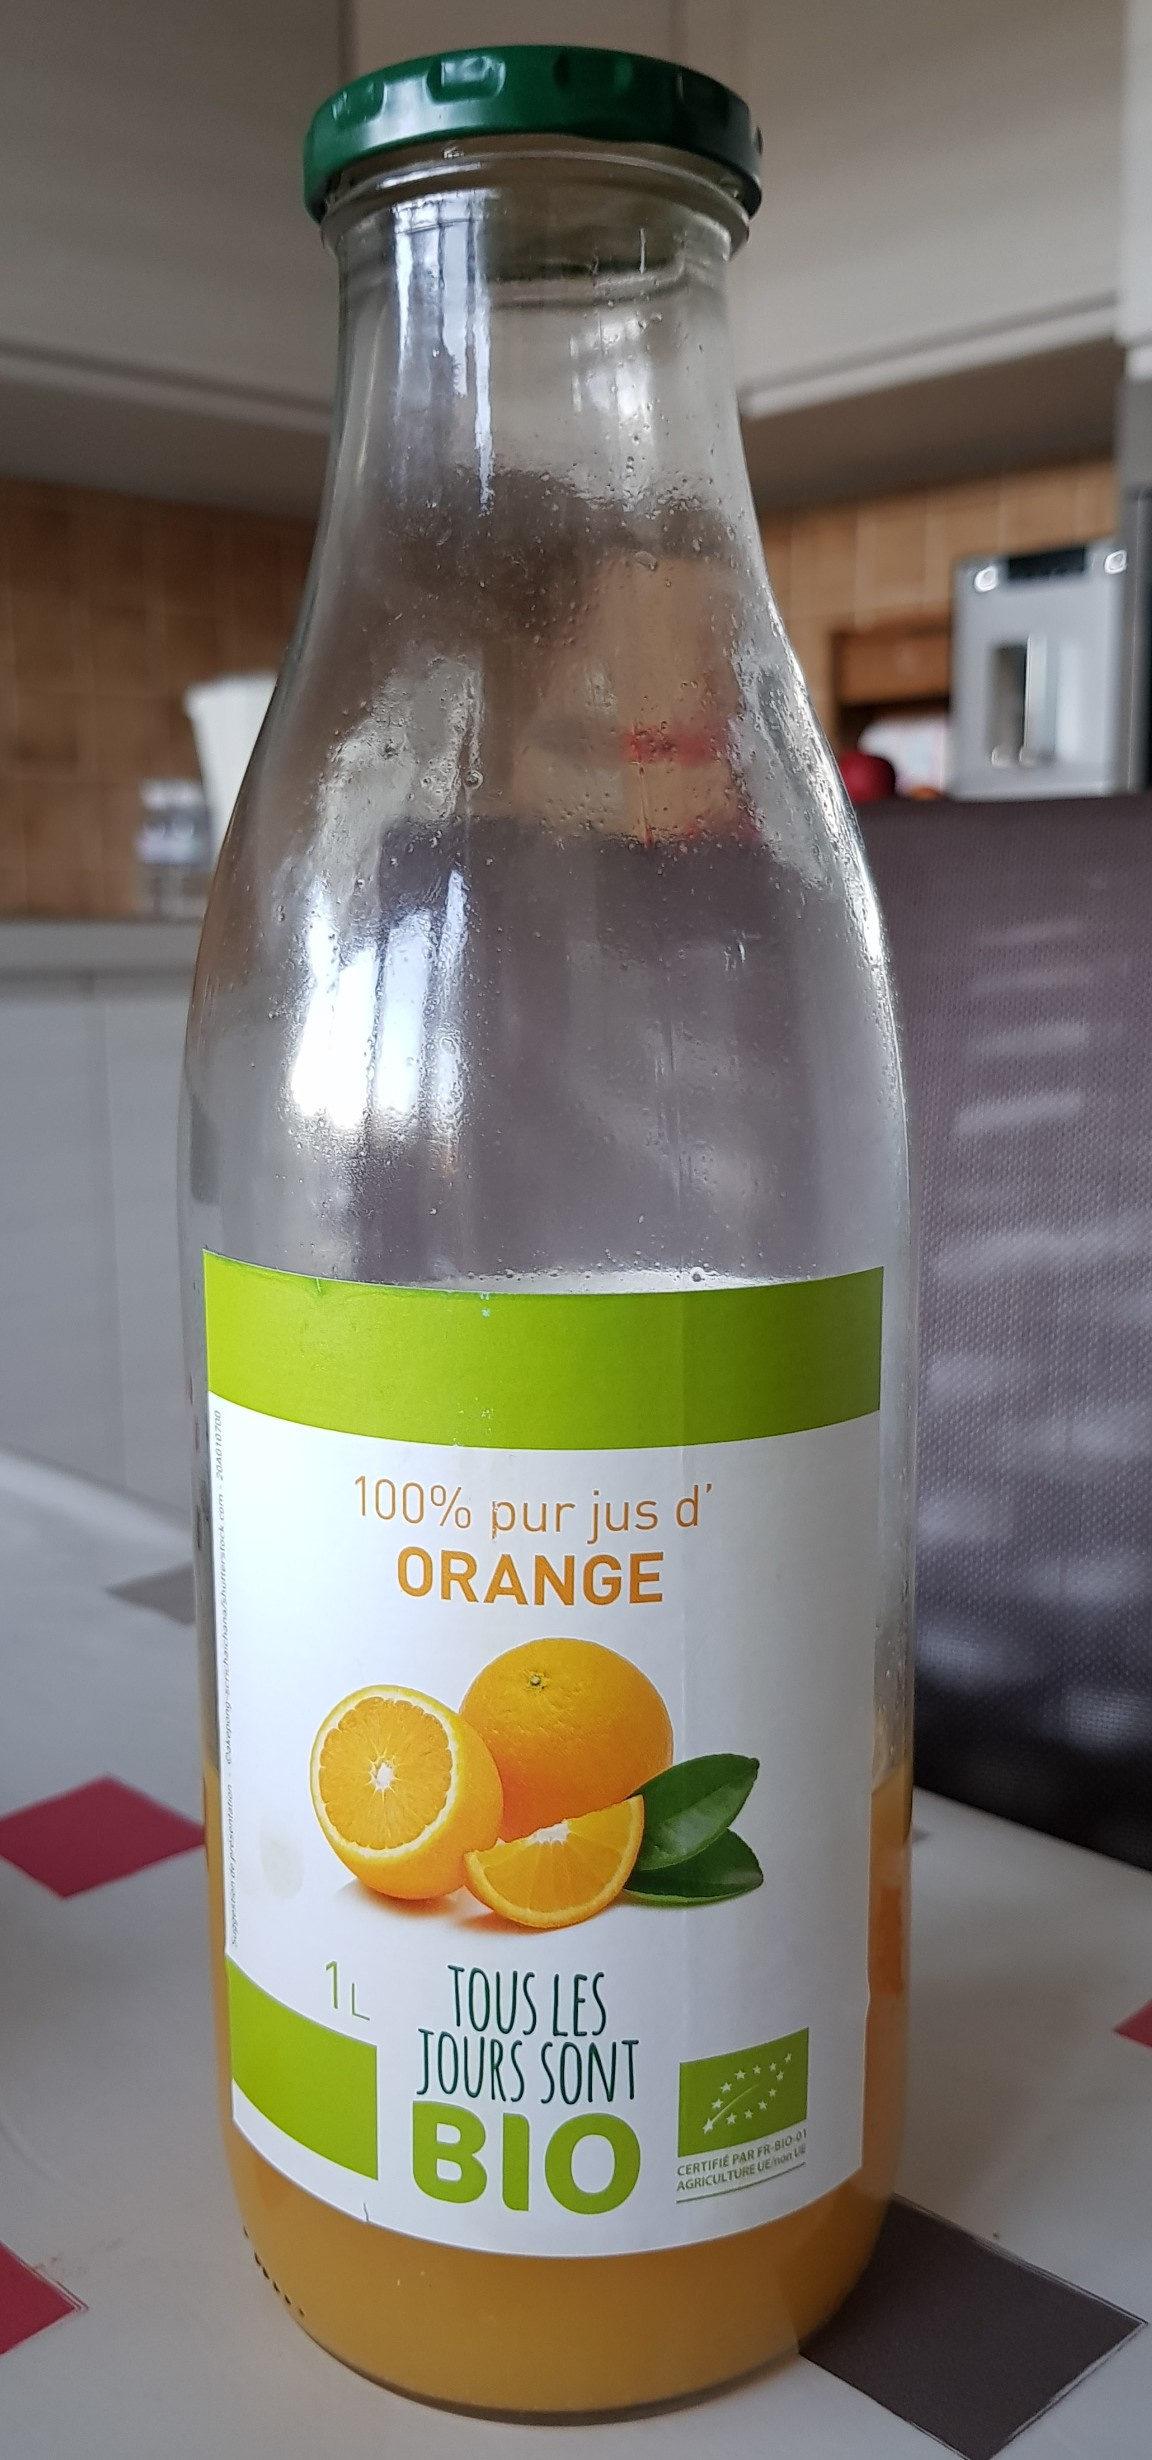 100% pur jus d'orange - Product - fr